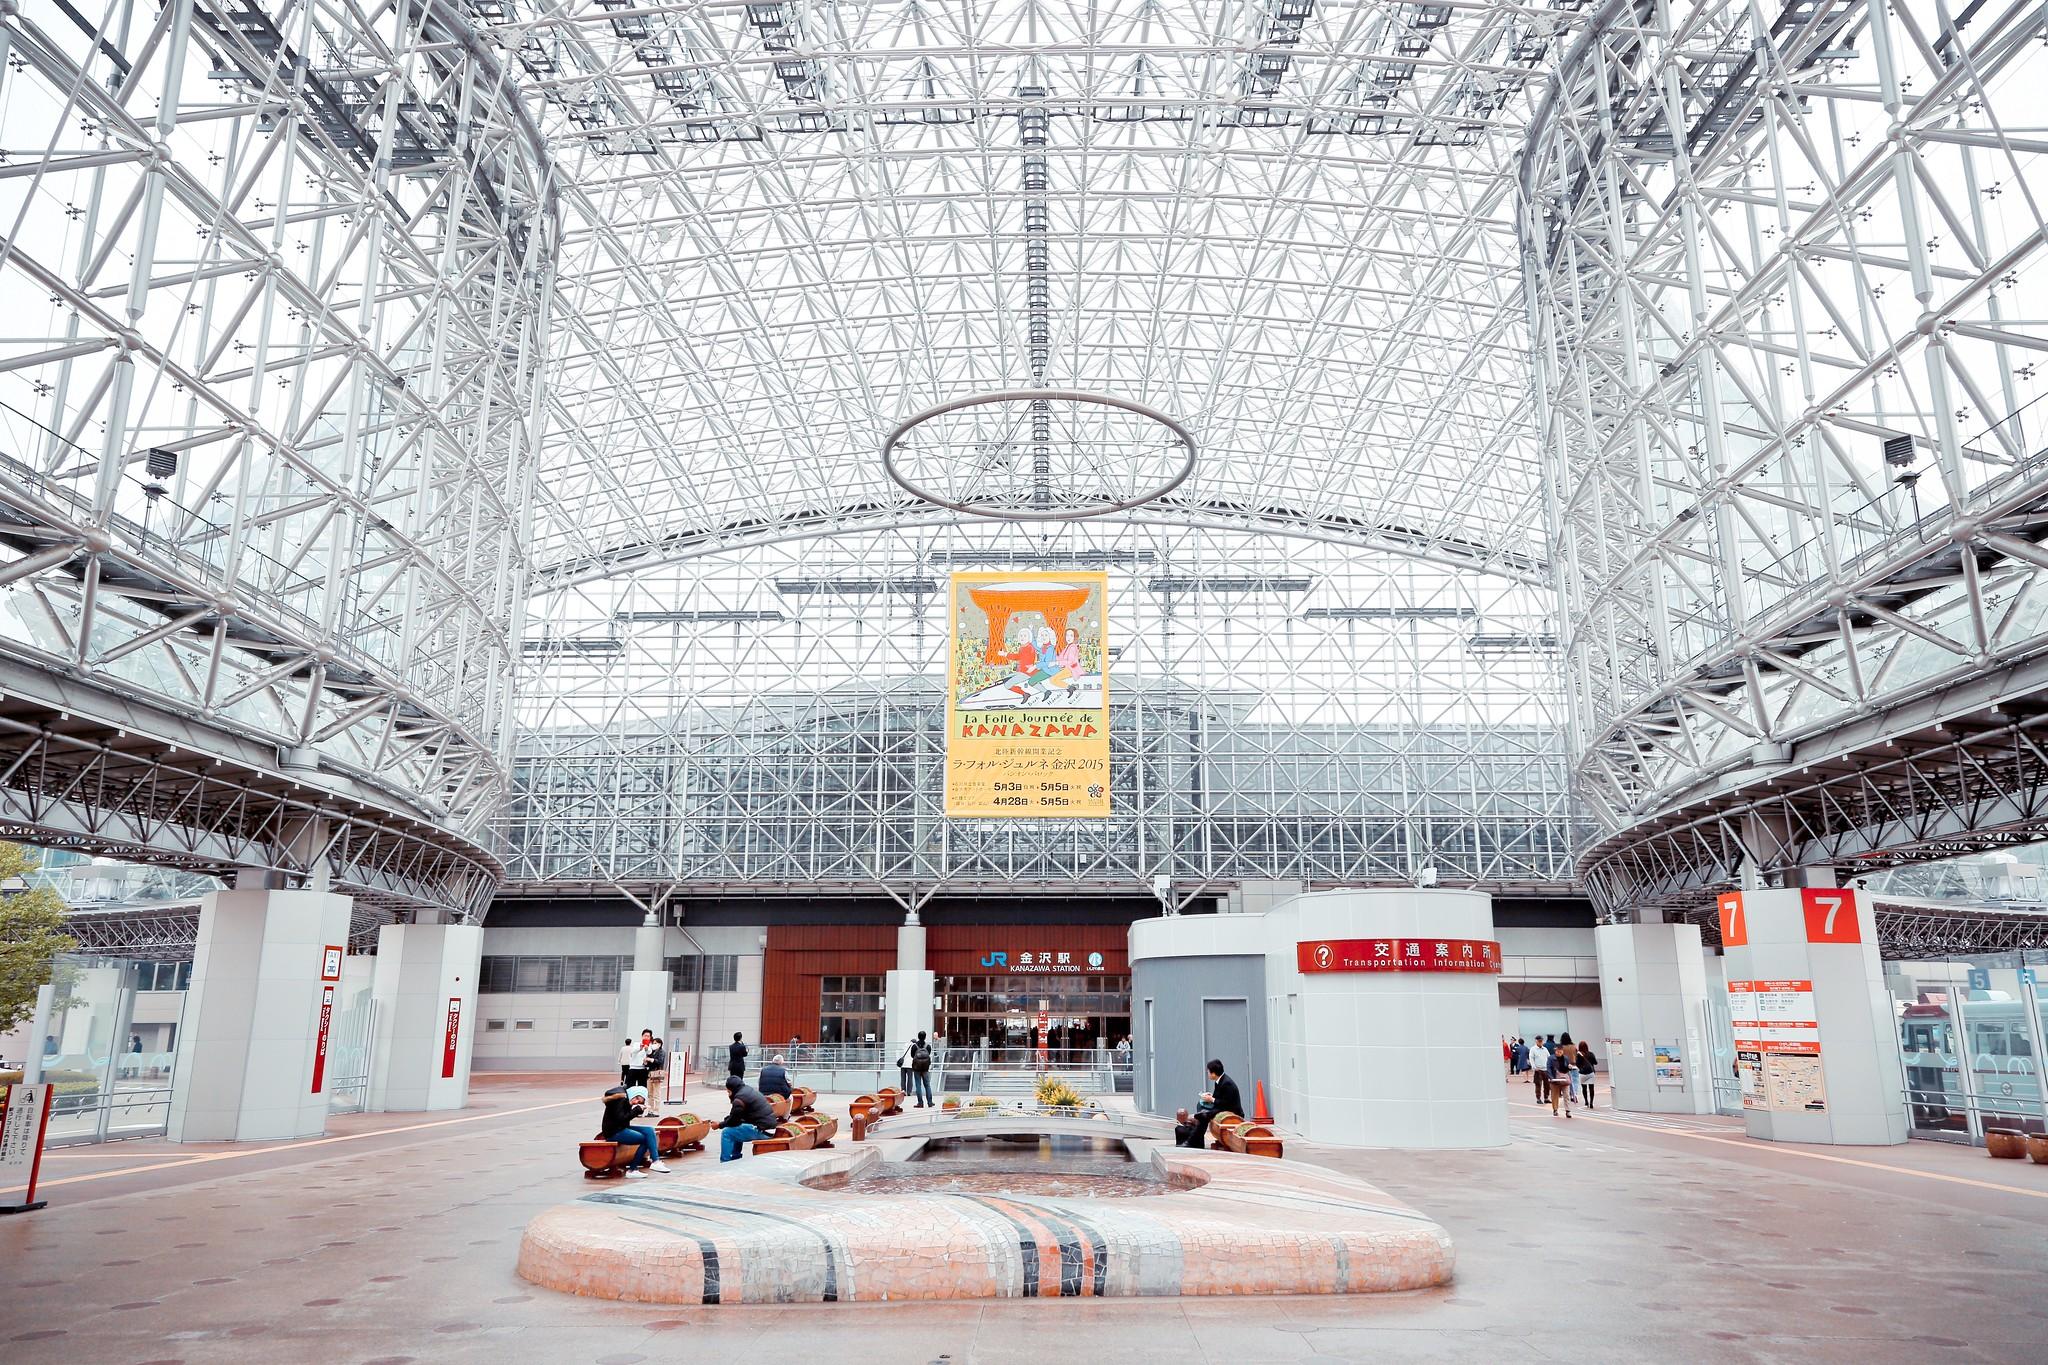 JR金沢駅 Kanazawa Station